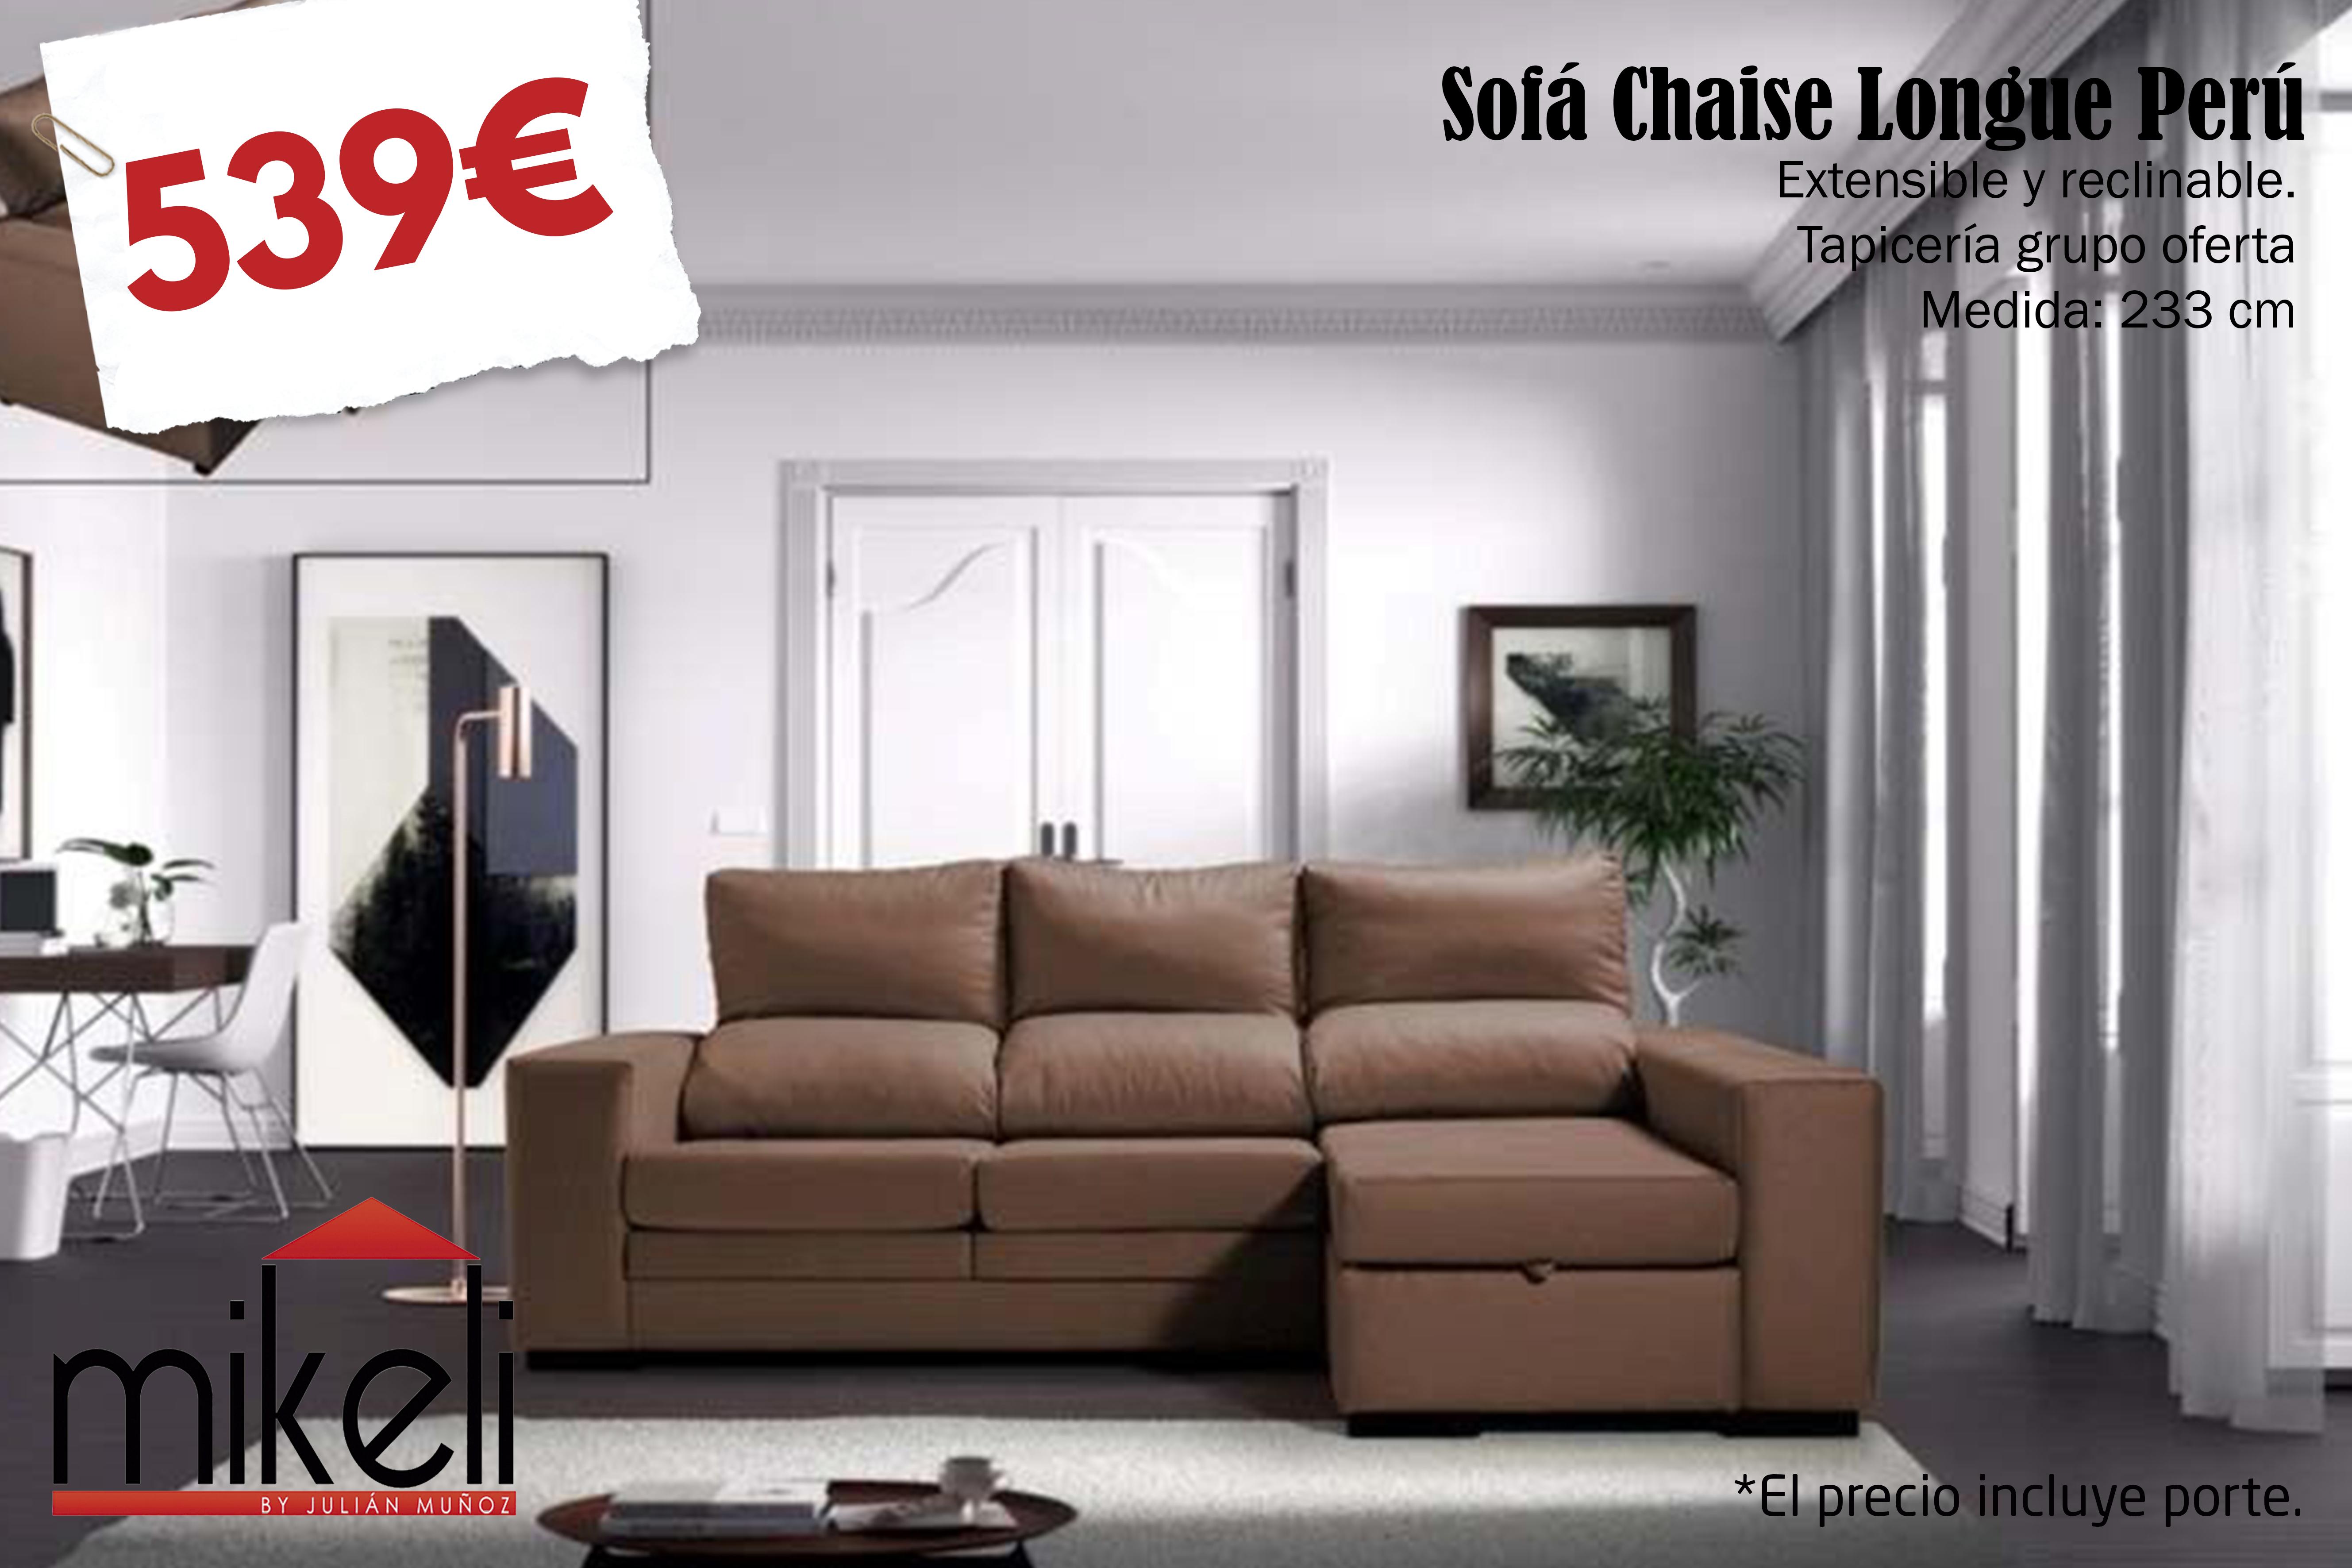 Tiendas muebles ceuta obtenga ideas dise o de muebles - Muebles arroyo ceuta ...